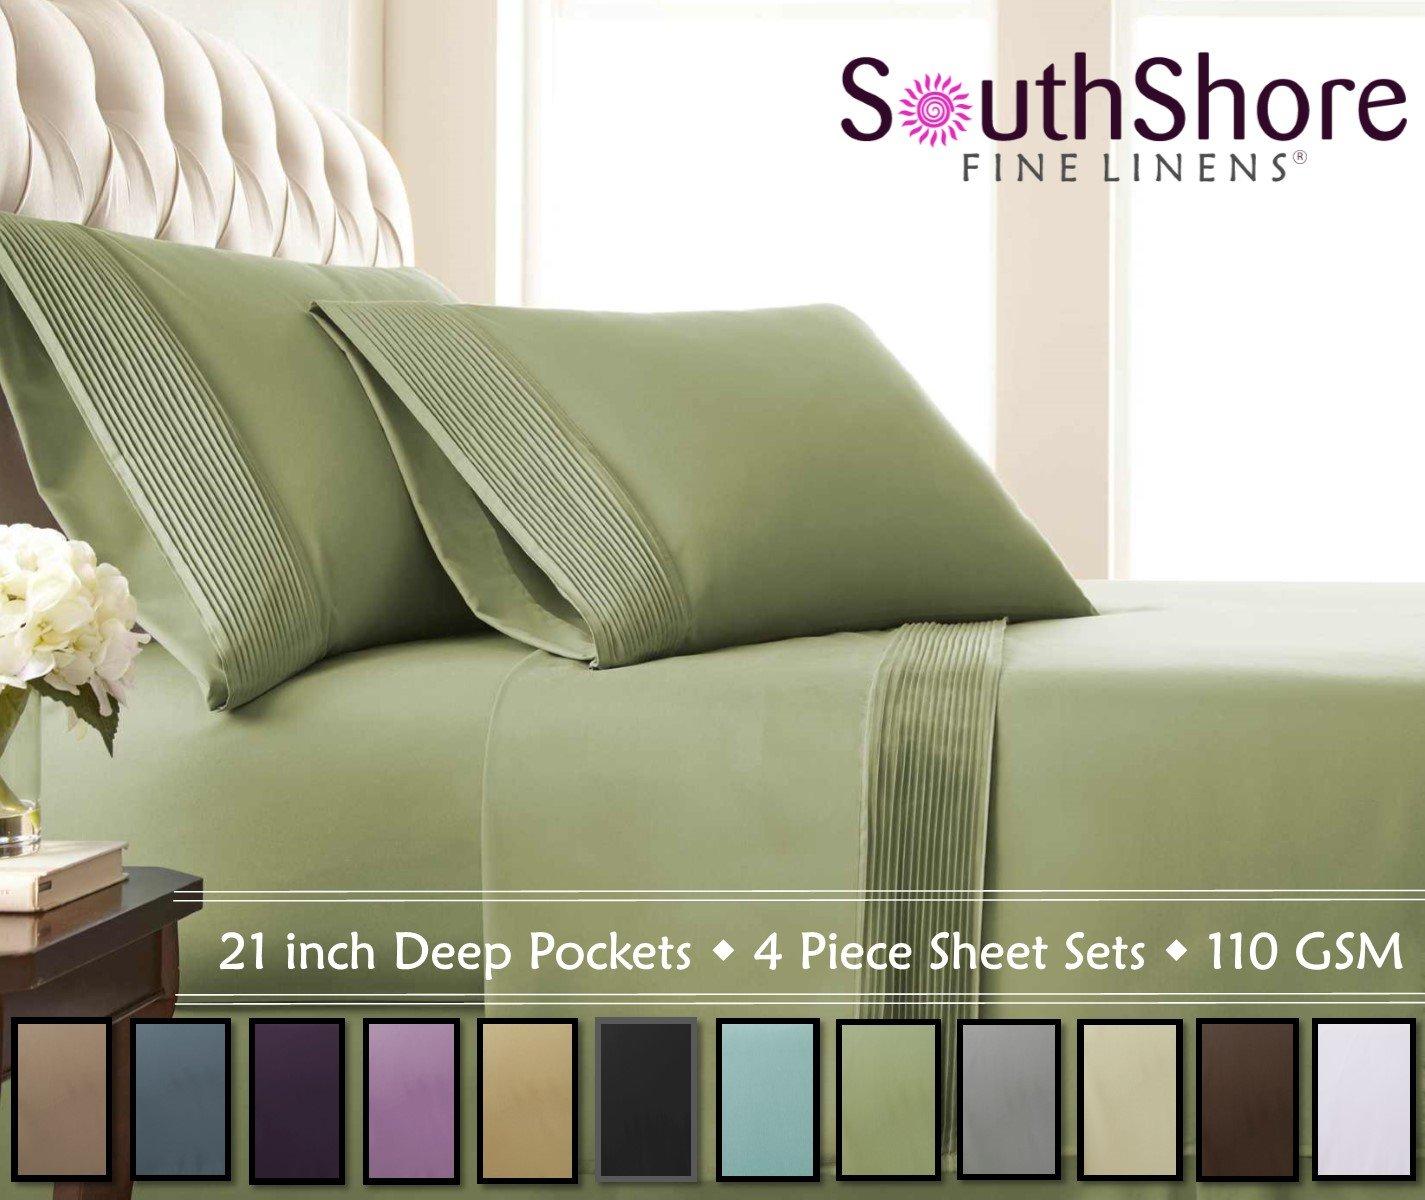 Southshore Fine Linens - 4 Piece - Extra Deep Pocket Pleated Sheet Set, Queen, SAGE Green